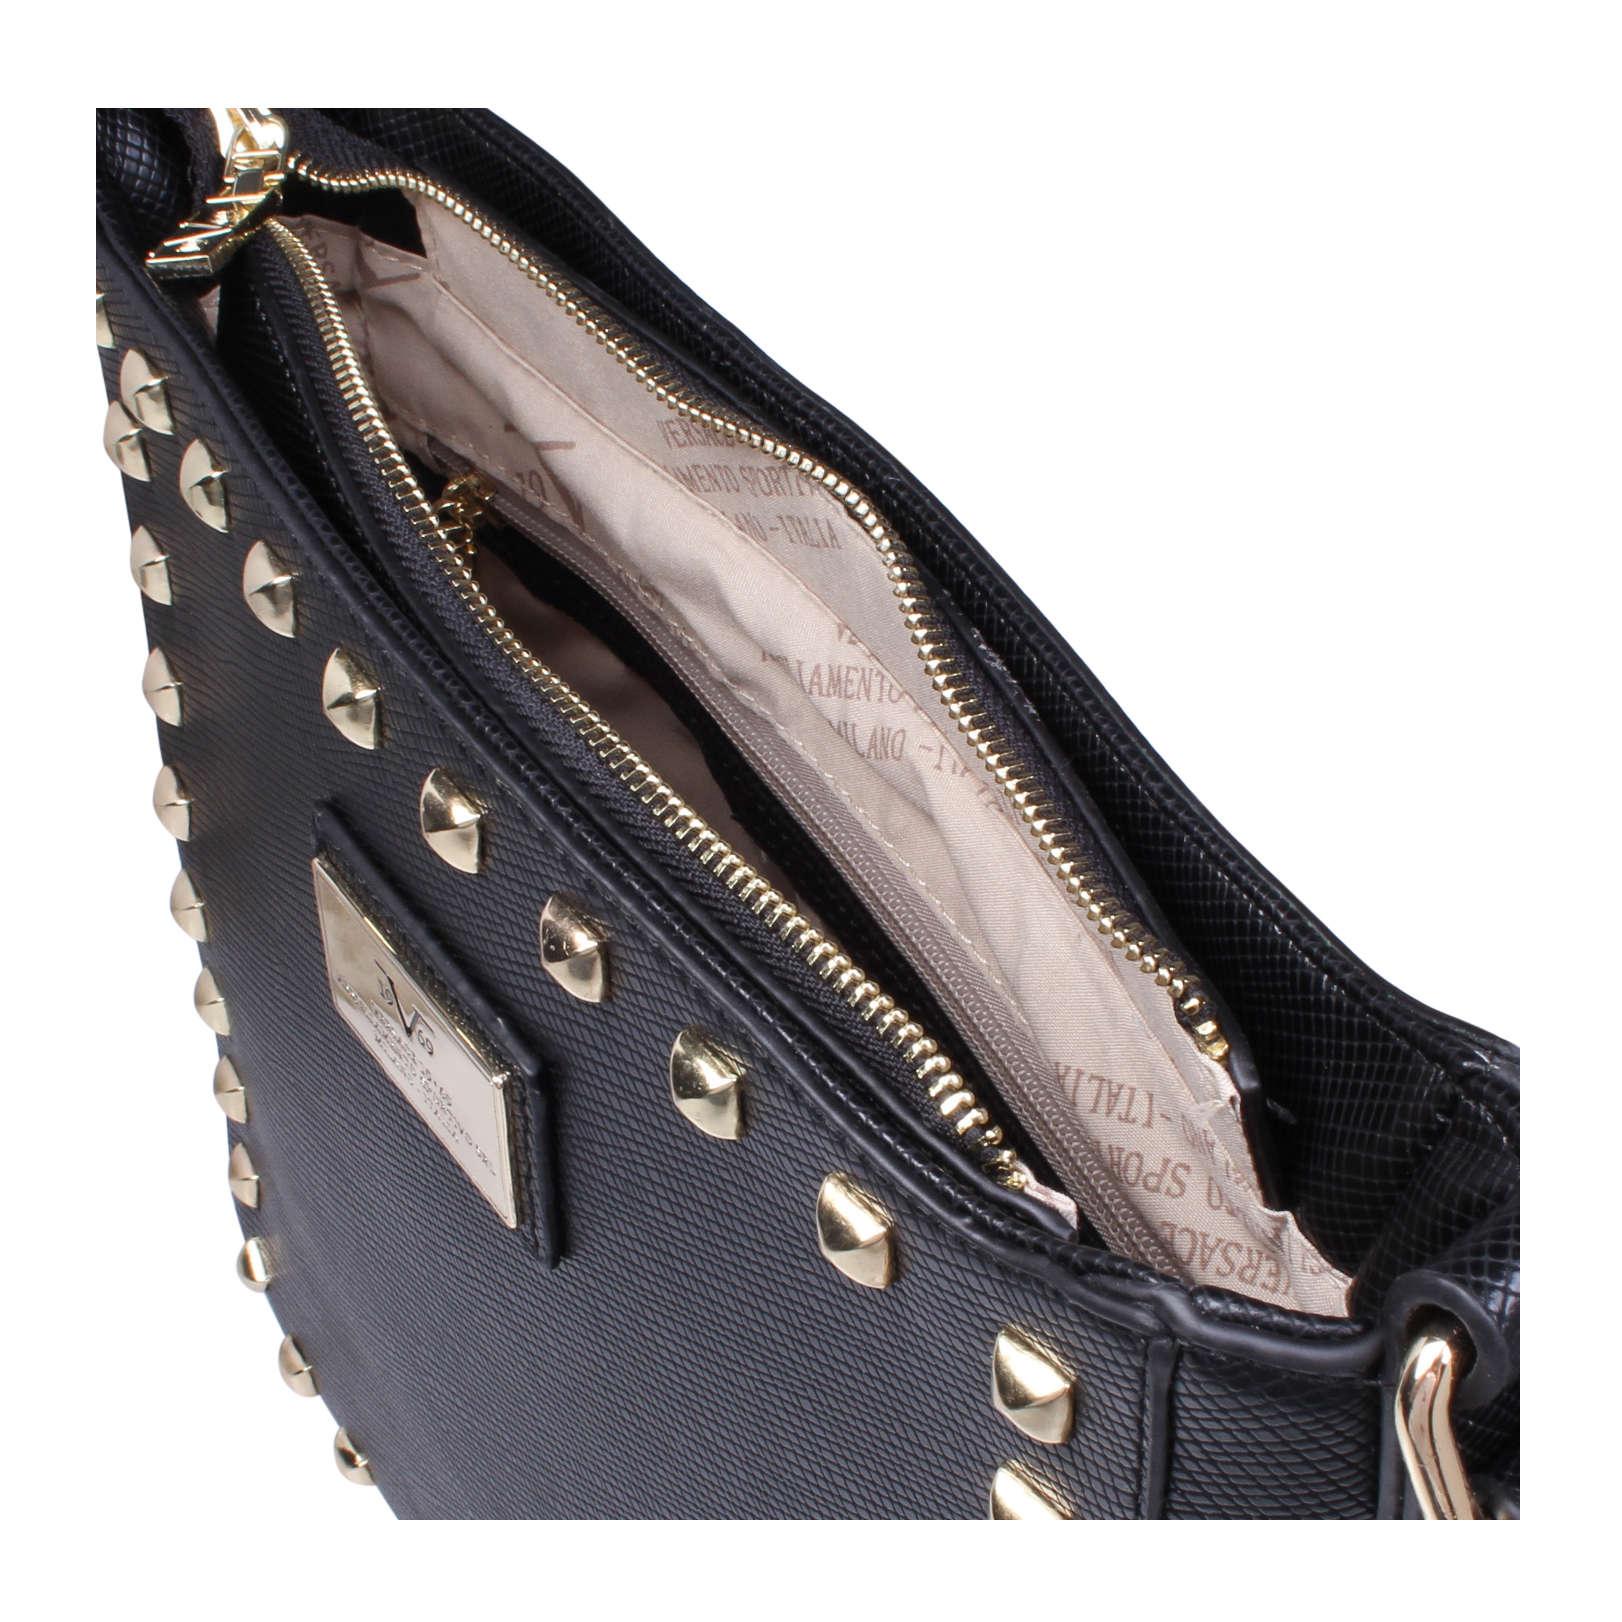 star versace 1969 star black handbags by versace 1969. Black Bedroom Furniture Sets. Home Design Ideas